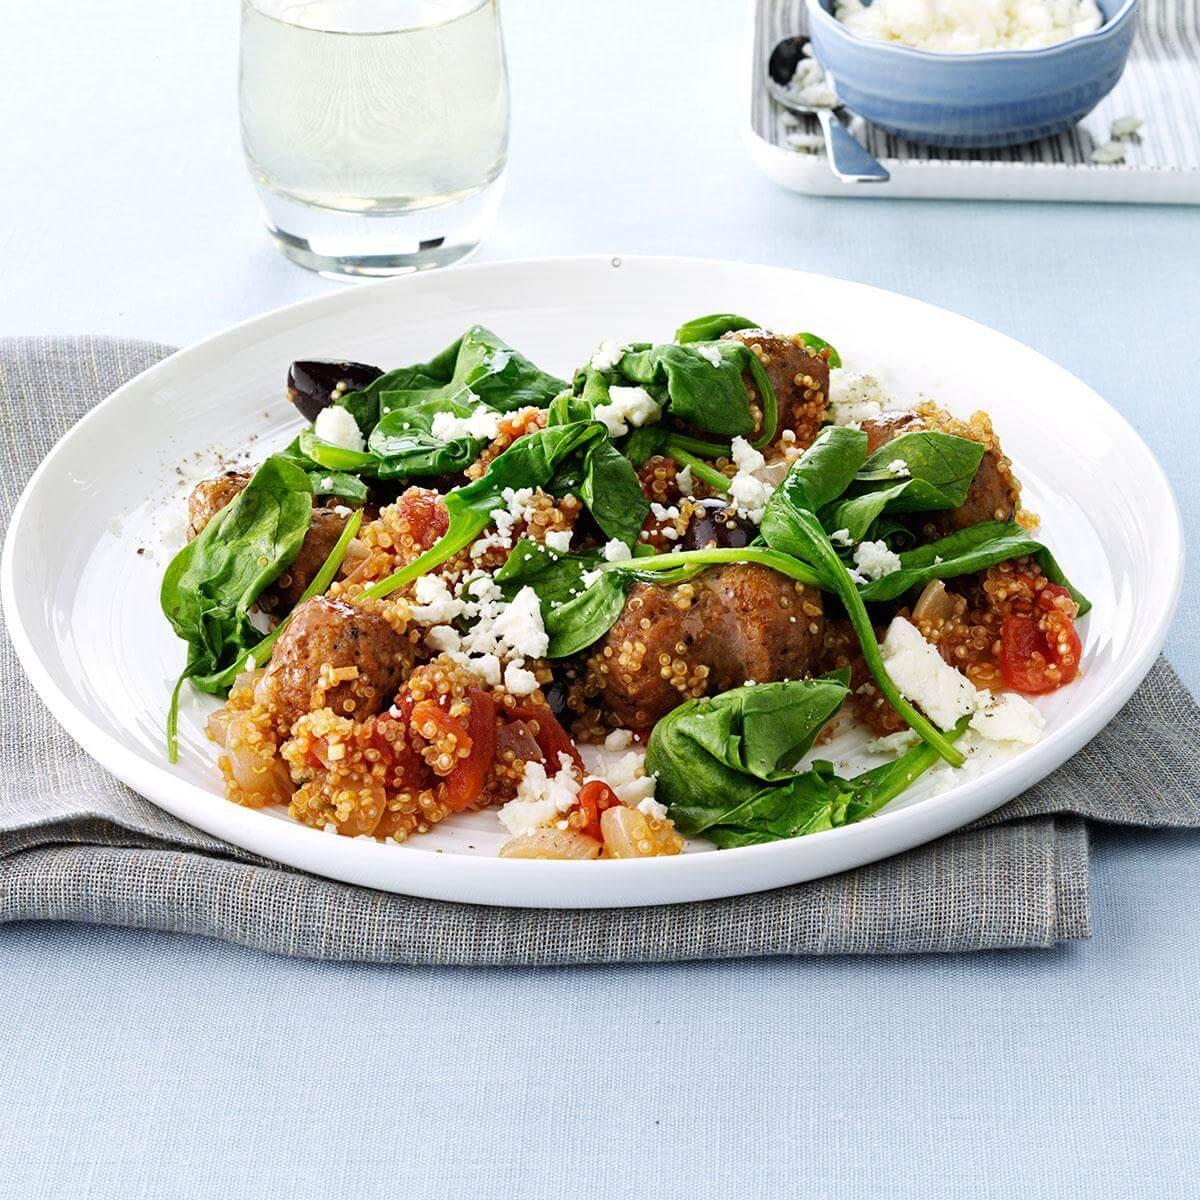 Mediterranean One-Dish Meal Recipe